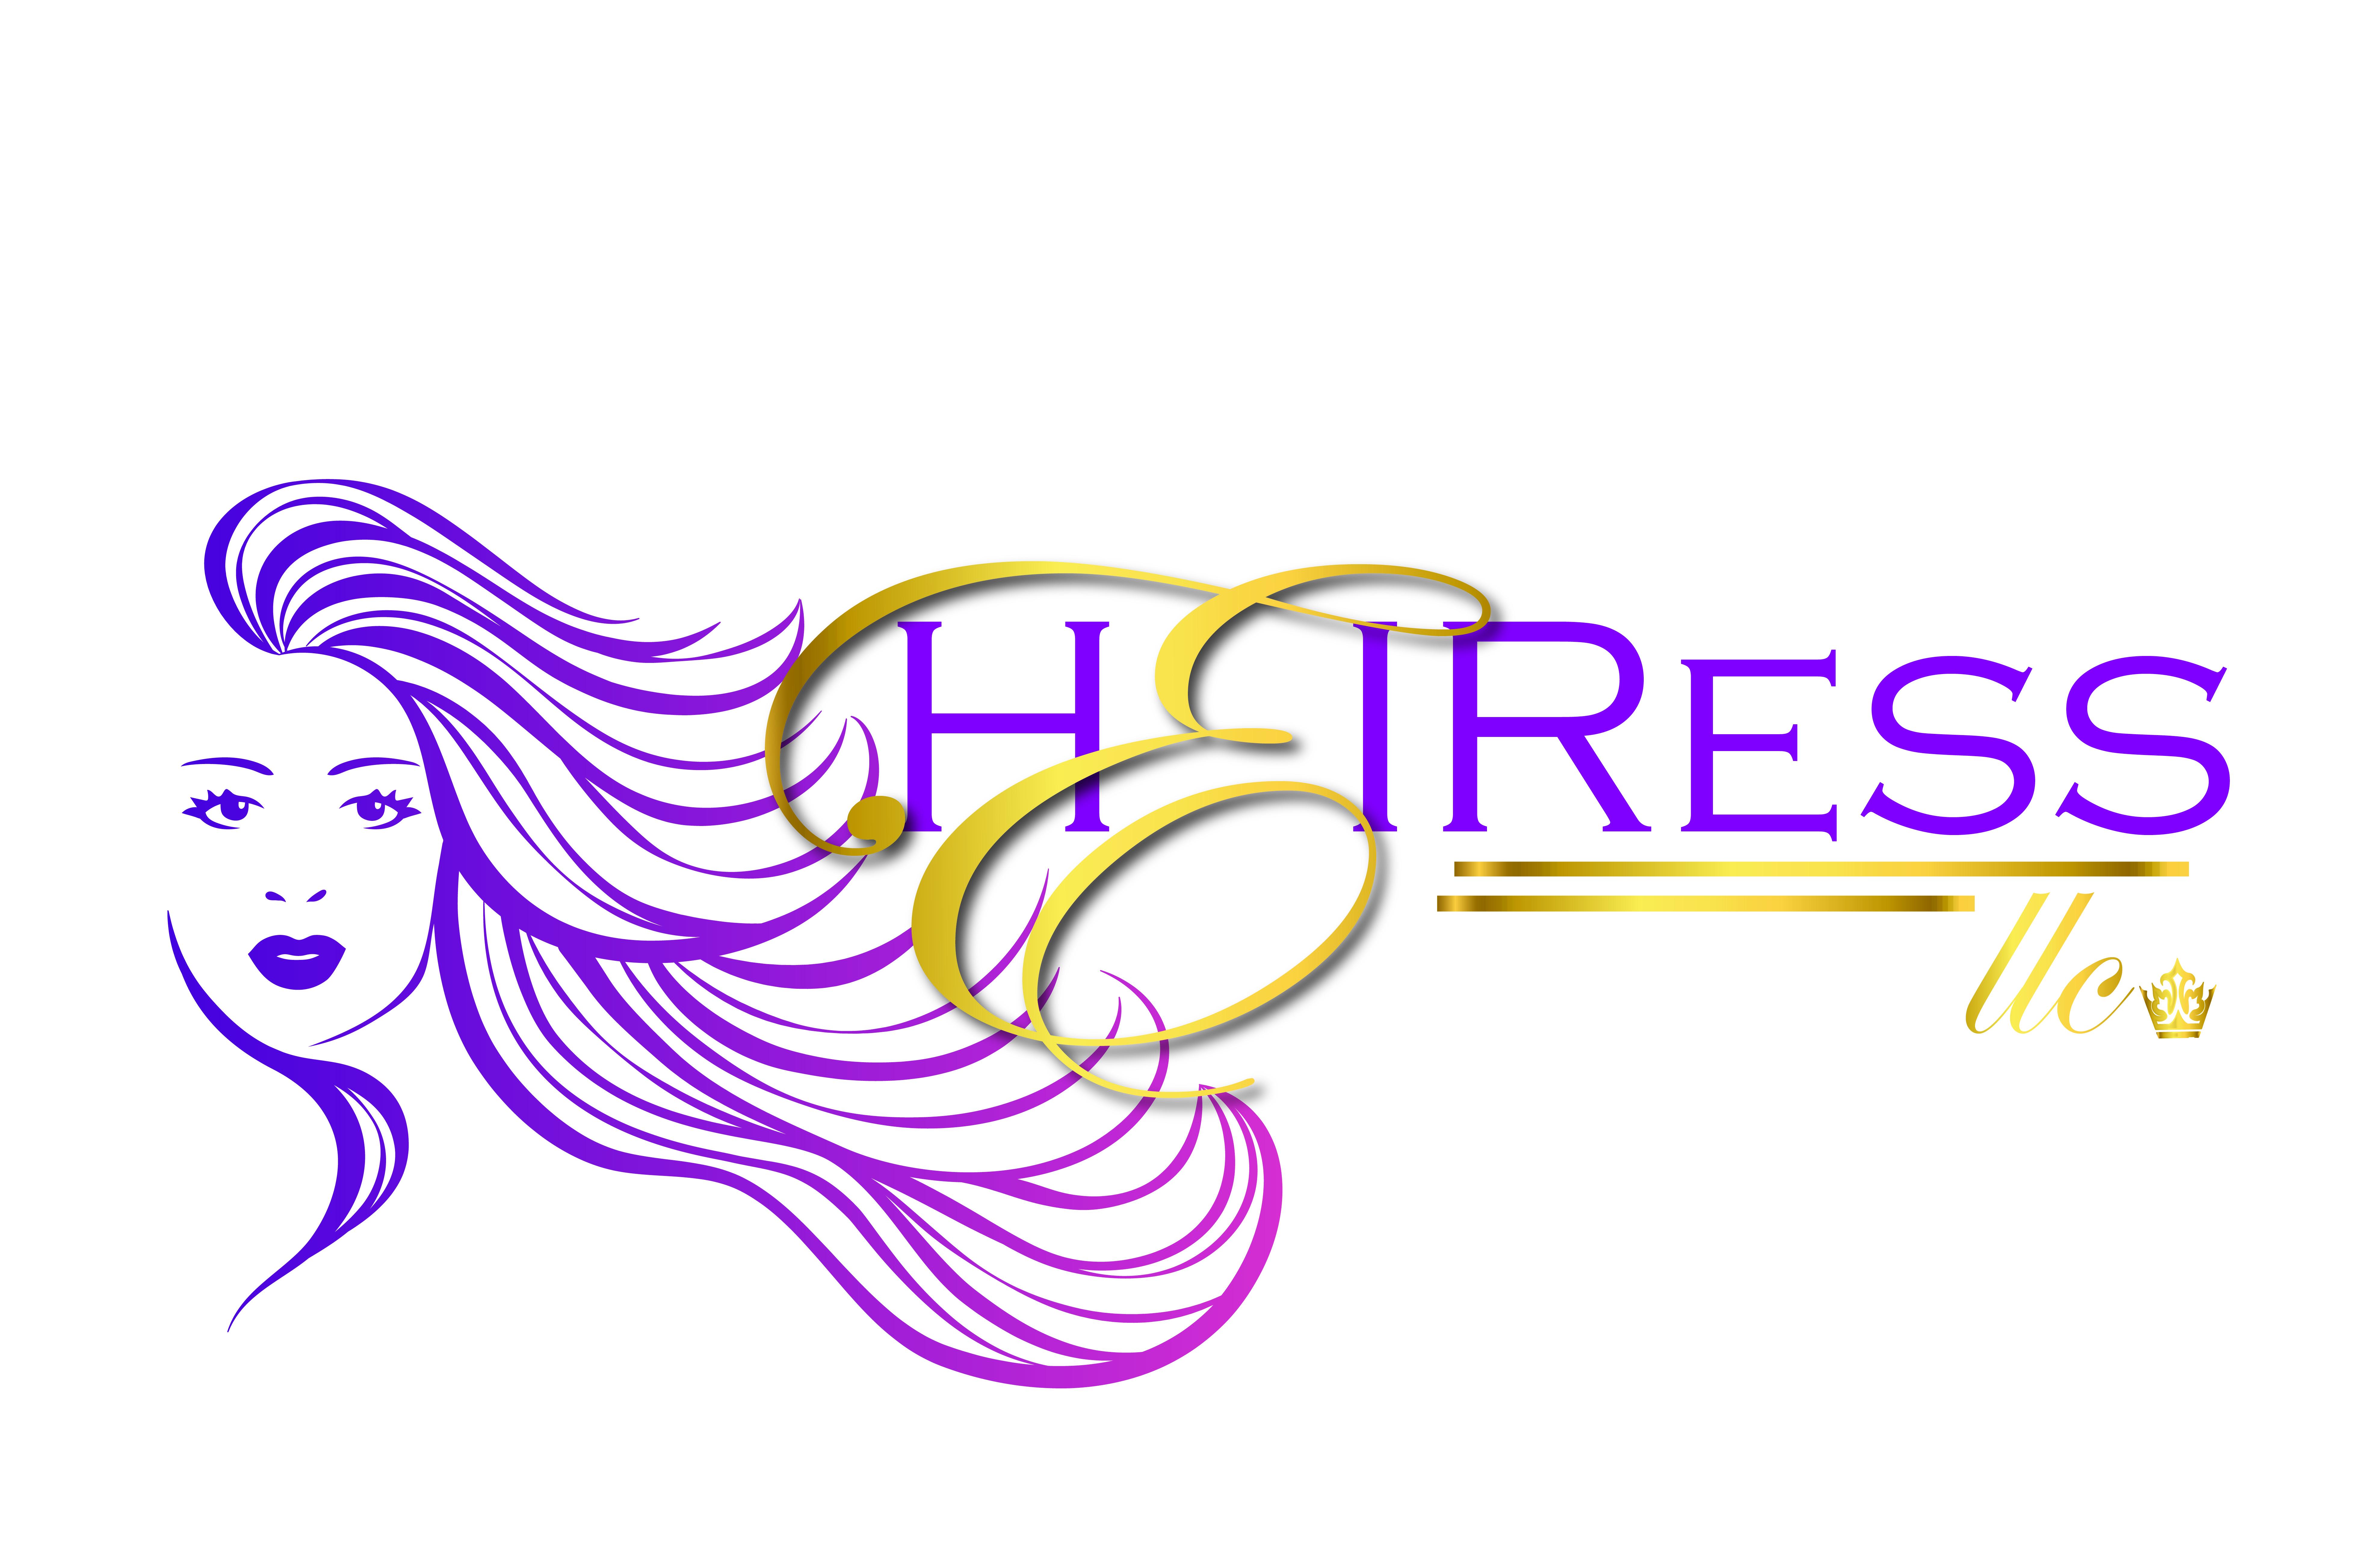 Heiress-01